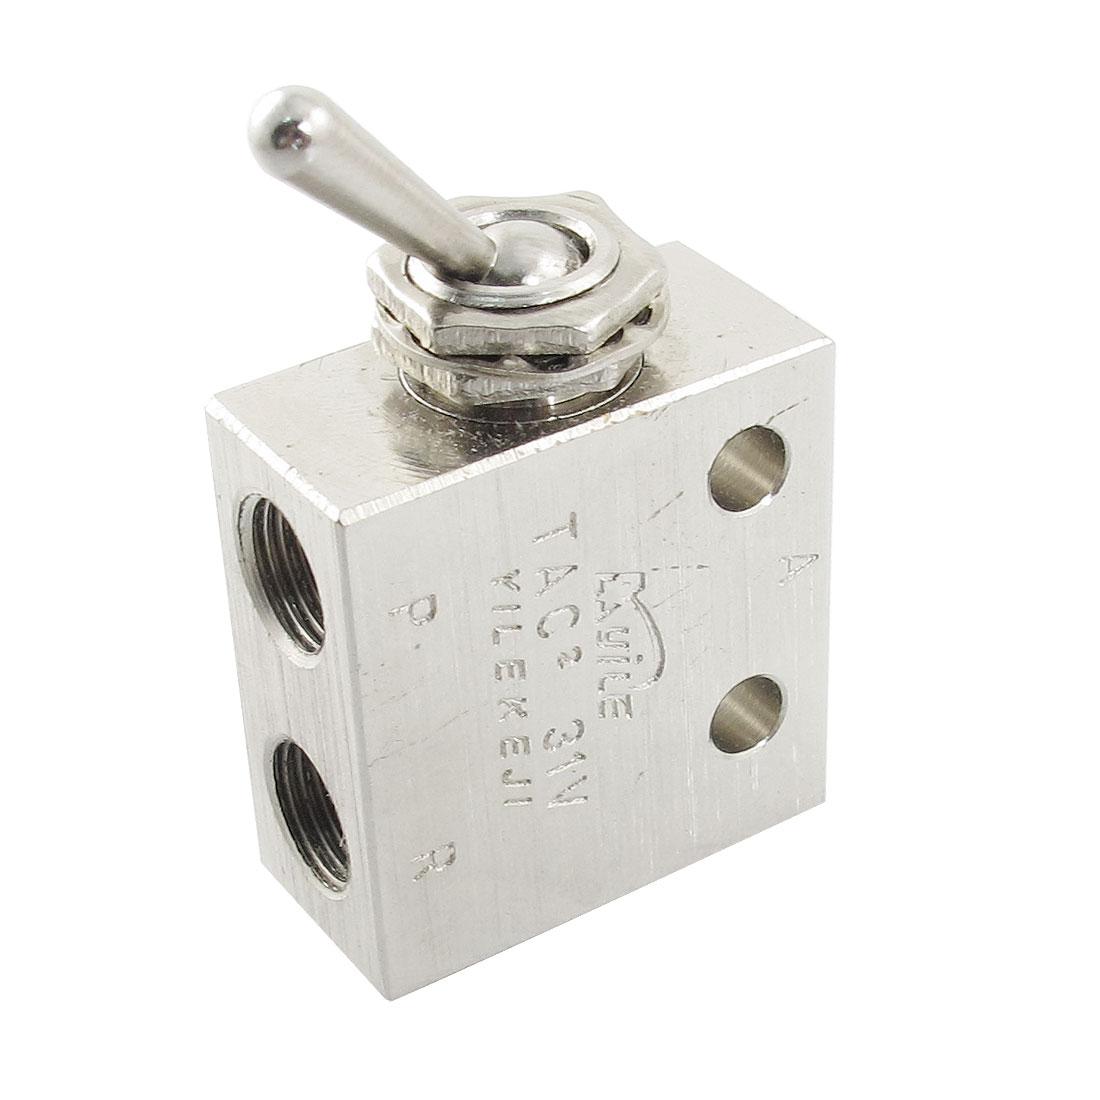 "1/8""PT Thread 2 Position 3 Way Rectangle Mechanical Air Pneumatic Valve"